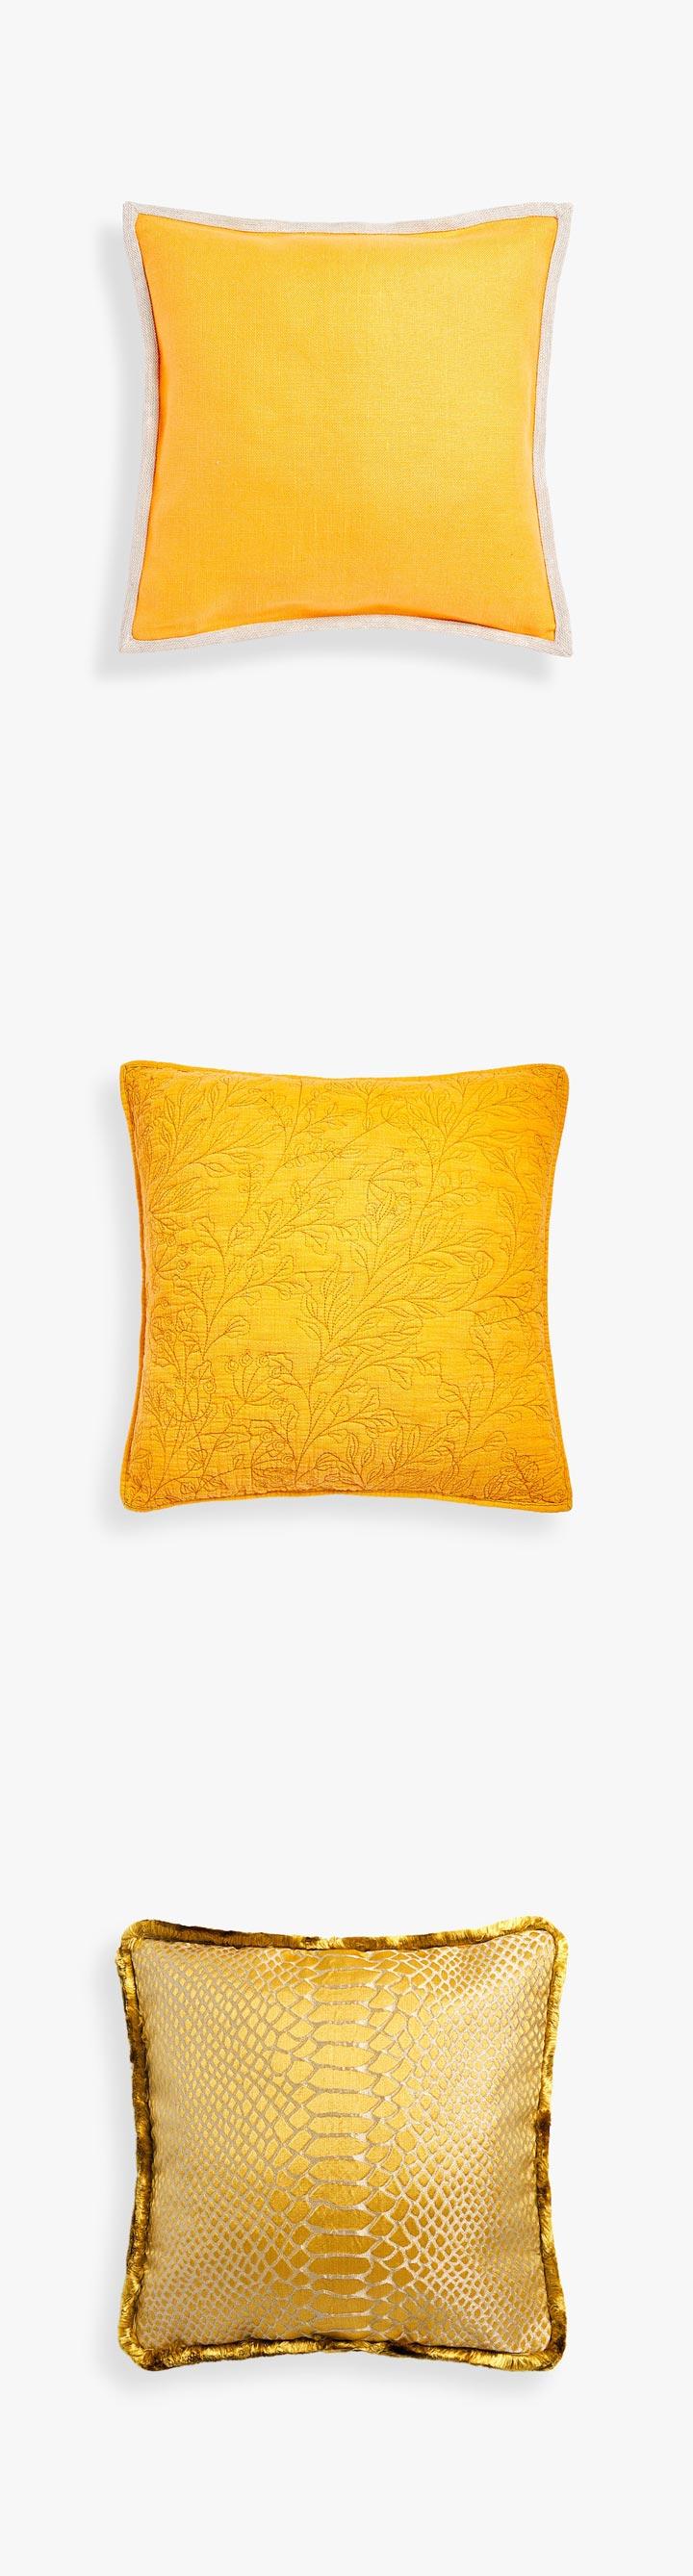 Cojines amarillos Zara Home sofá